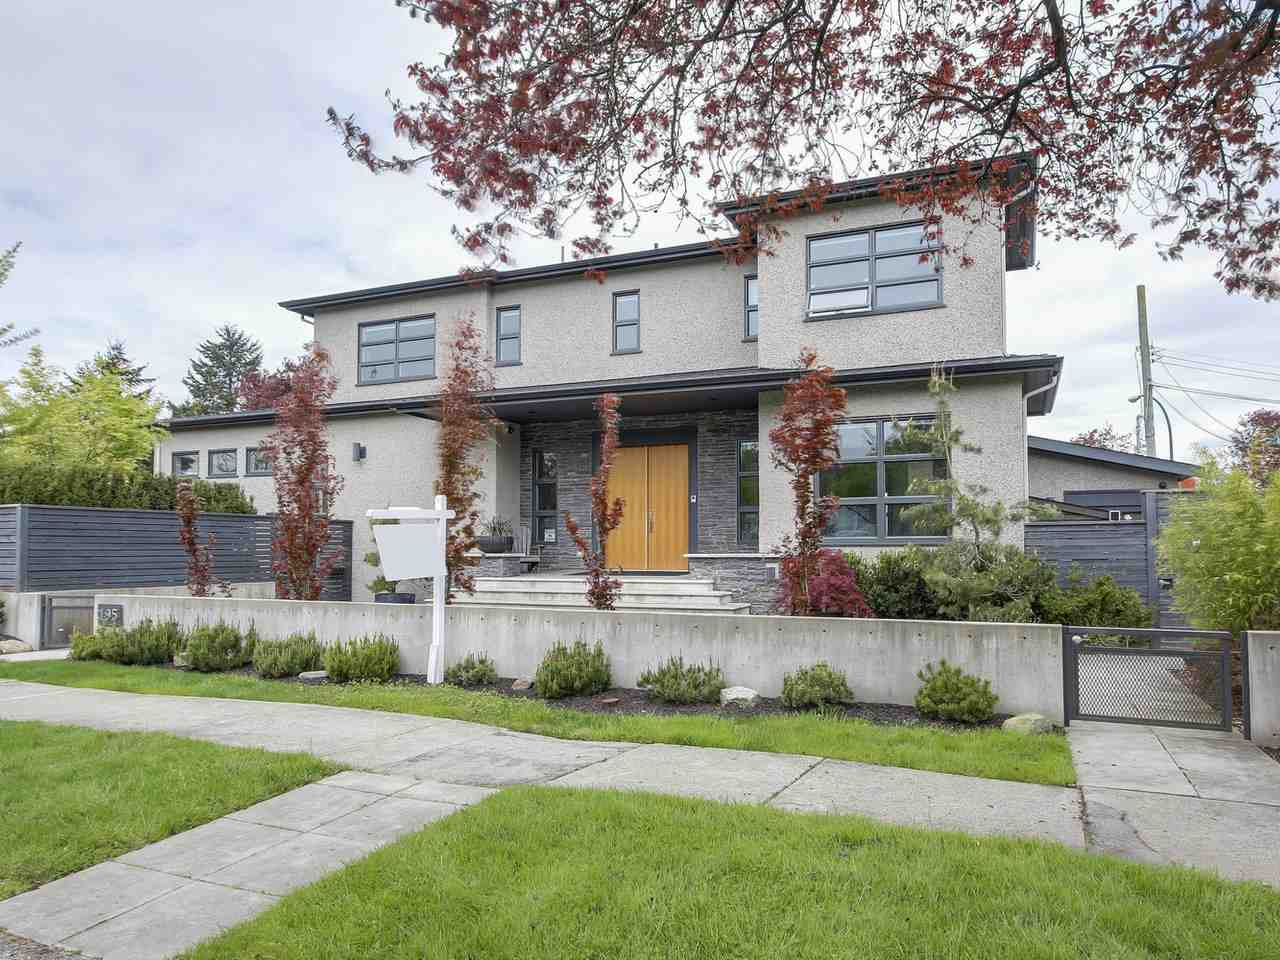 195 PEVERIL AVENUE, Vancouver, BC V5Y 2L5